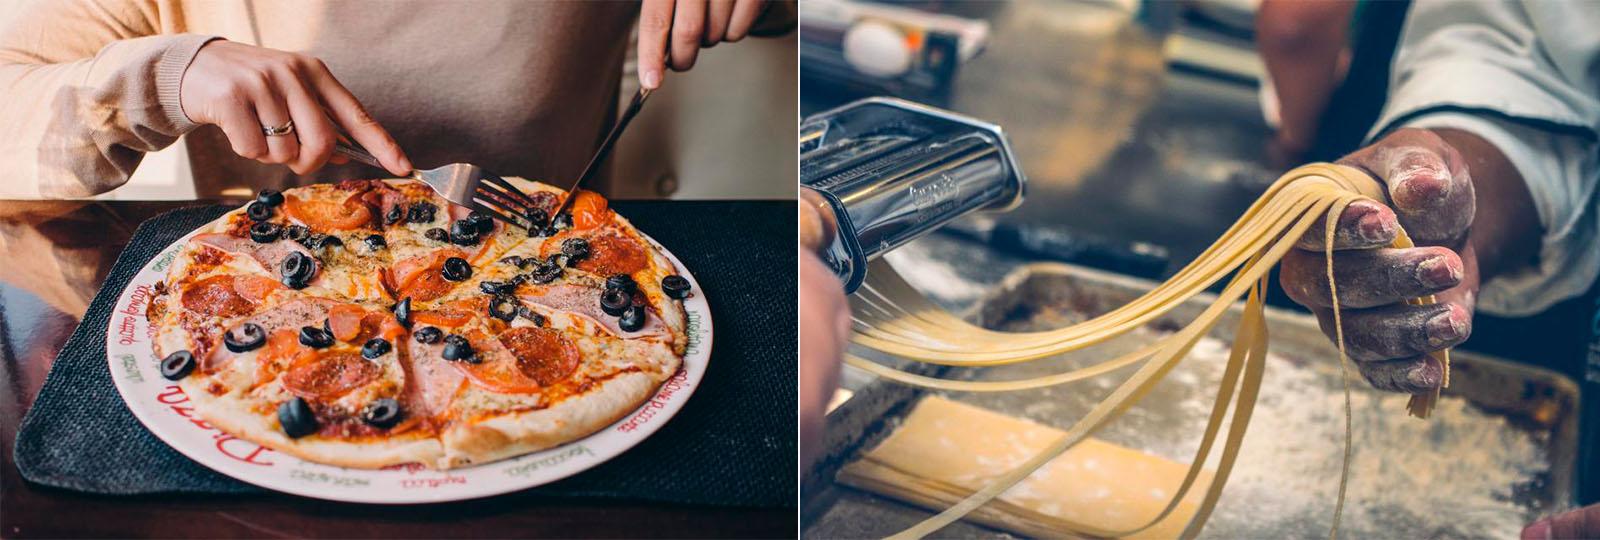 7 dicas para curtir o maravilhoso turismo gastronômico italiano